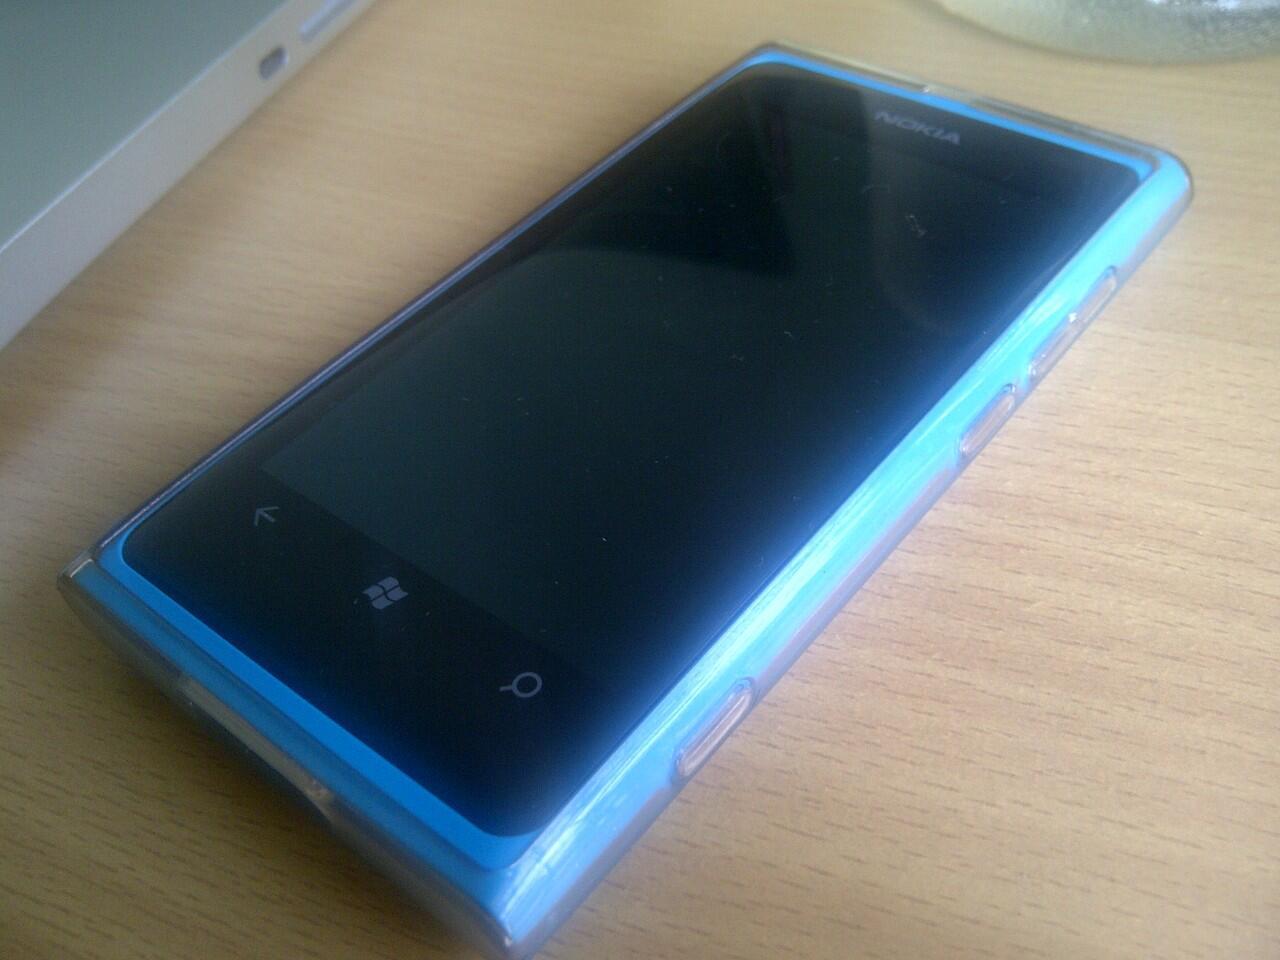 WTS nokia lumia 800 cyan